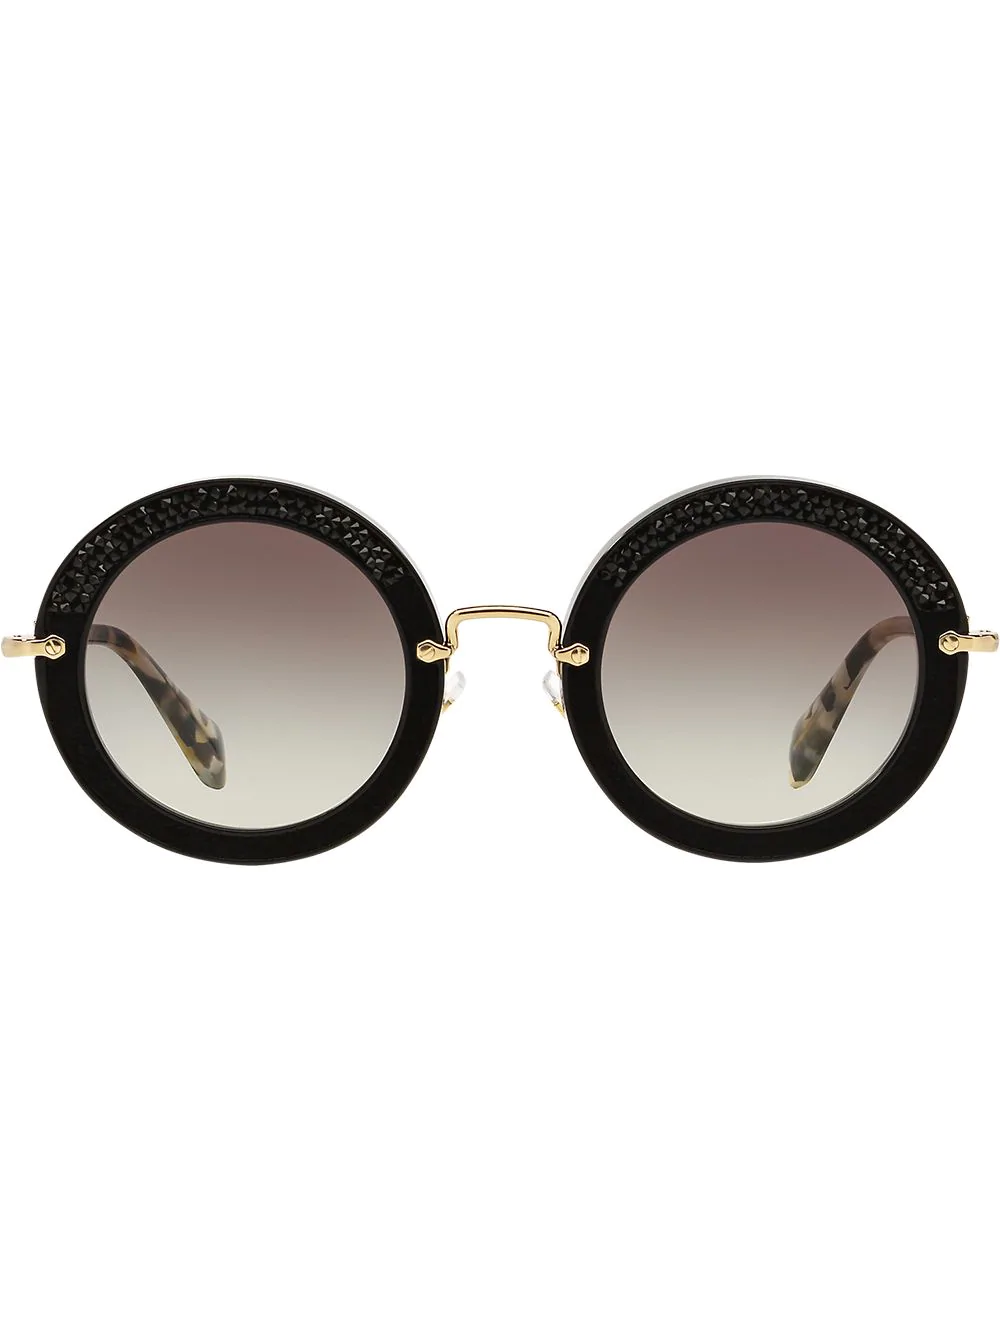 5d8c3f9e8b1 Miu Miu Eyewear Verzierte Sonnenbrille - Schwarz In Black